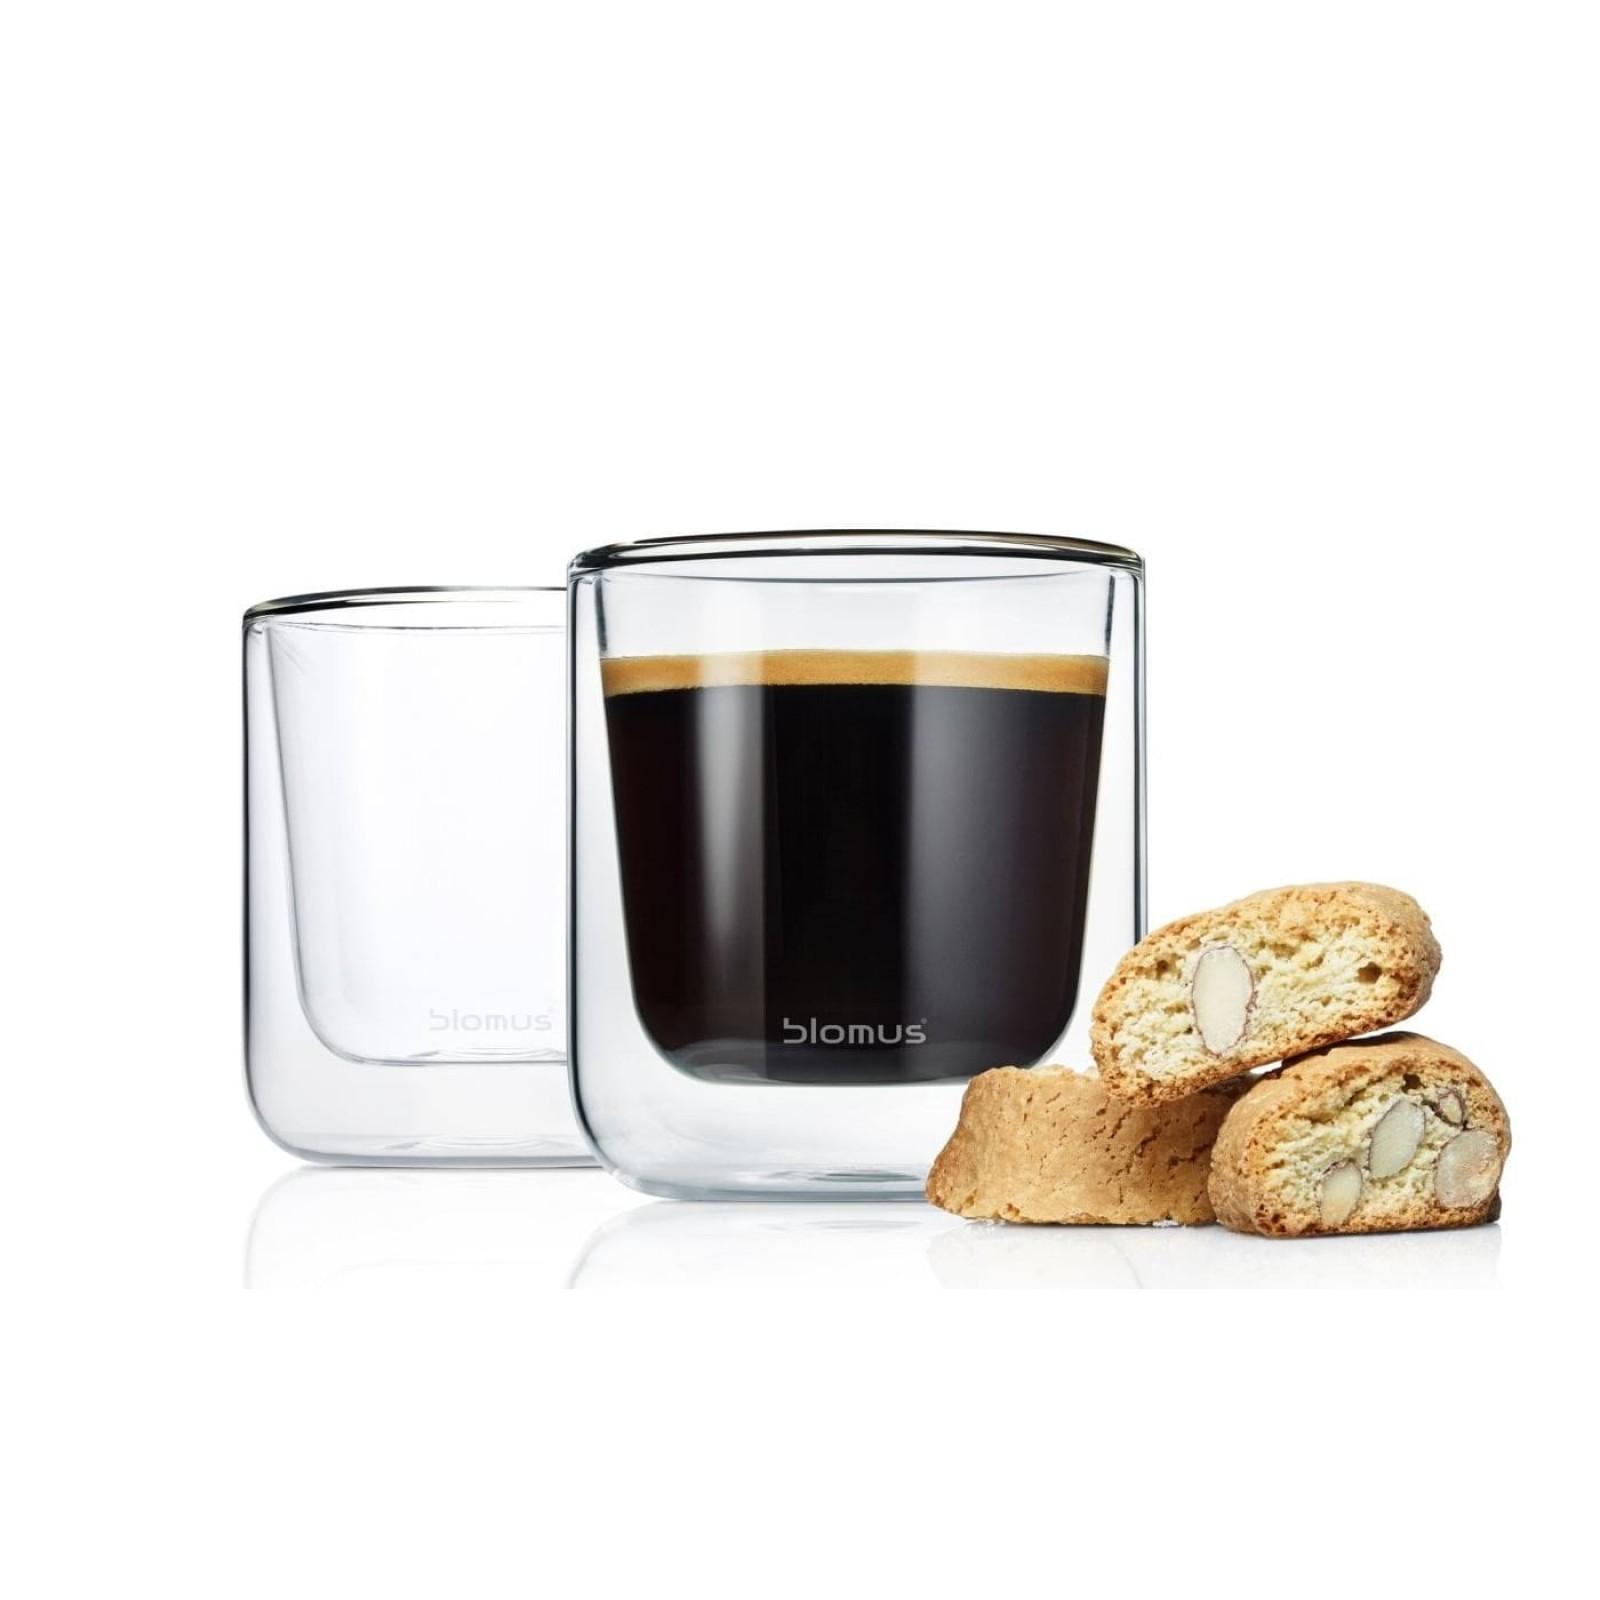 NERO Insulated Coffee Glasses 200 ml (Set of 2) - Blomus